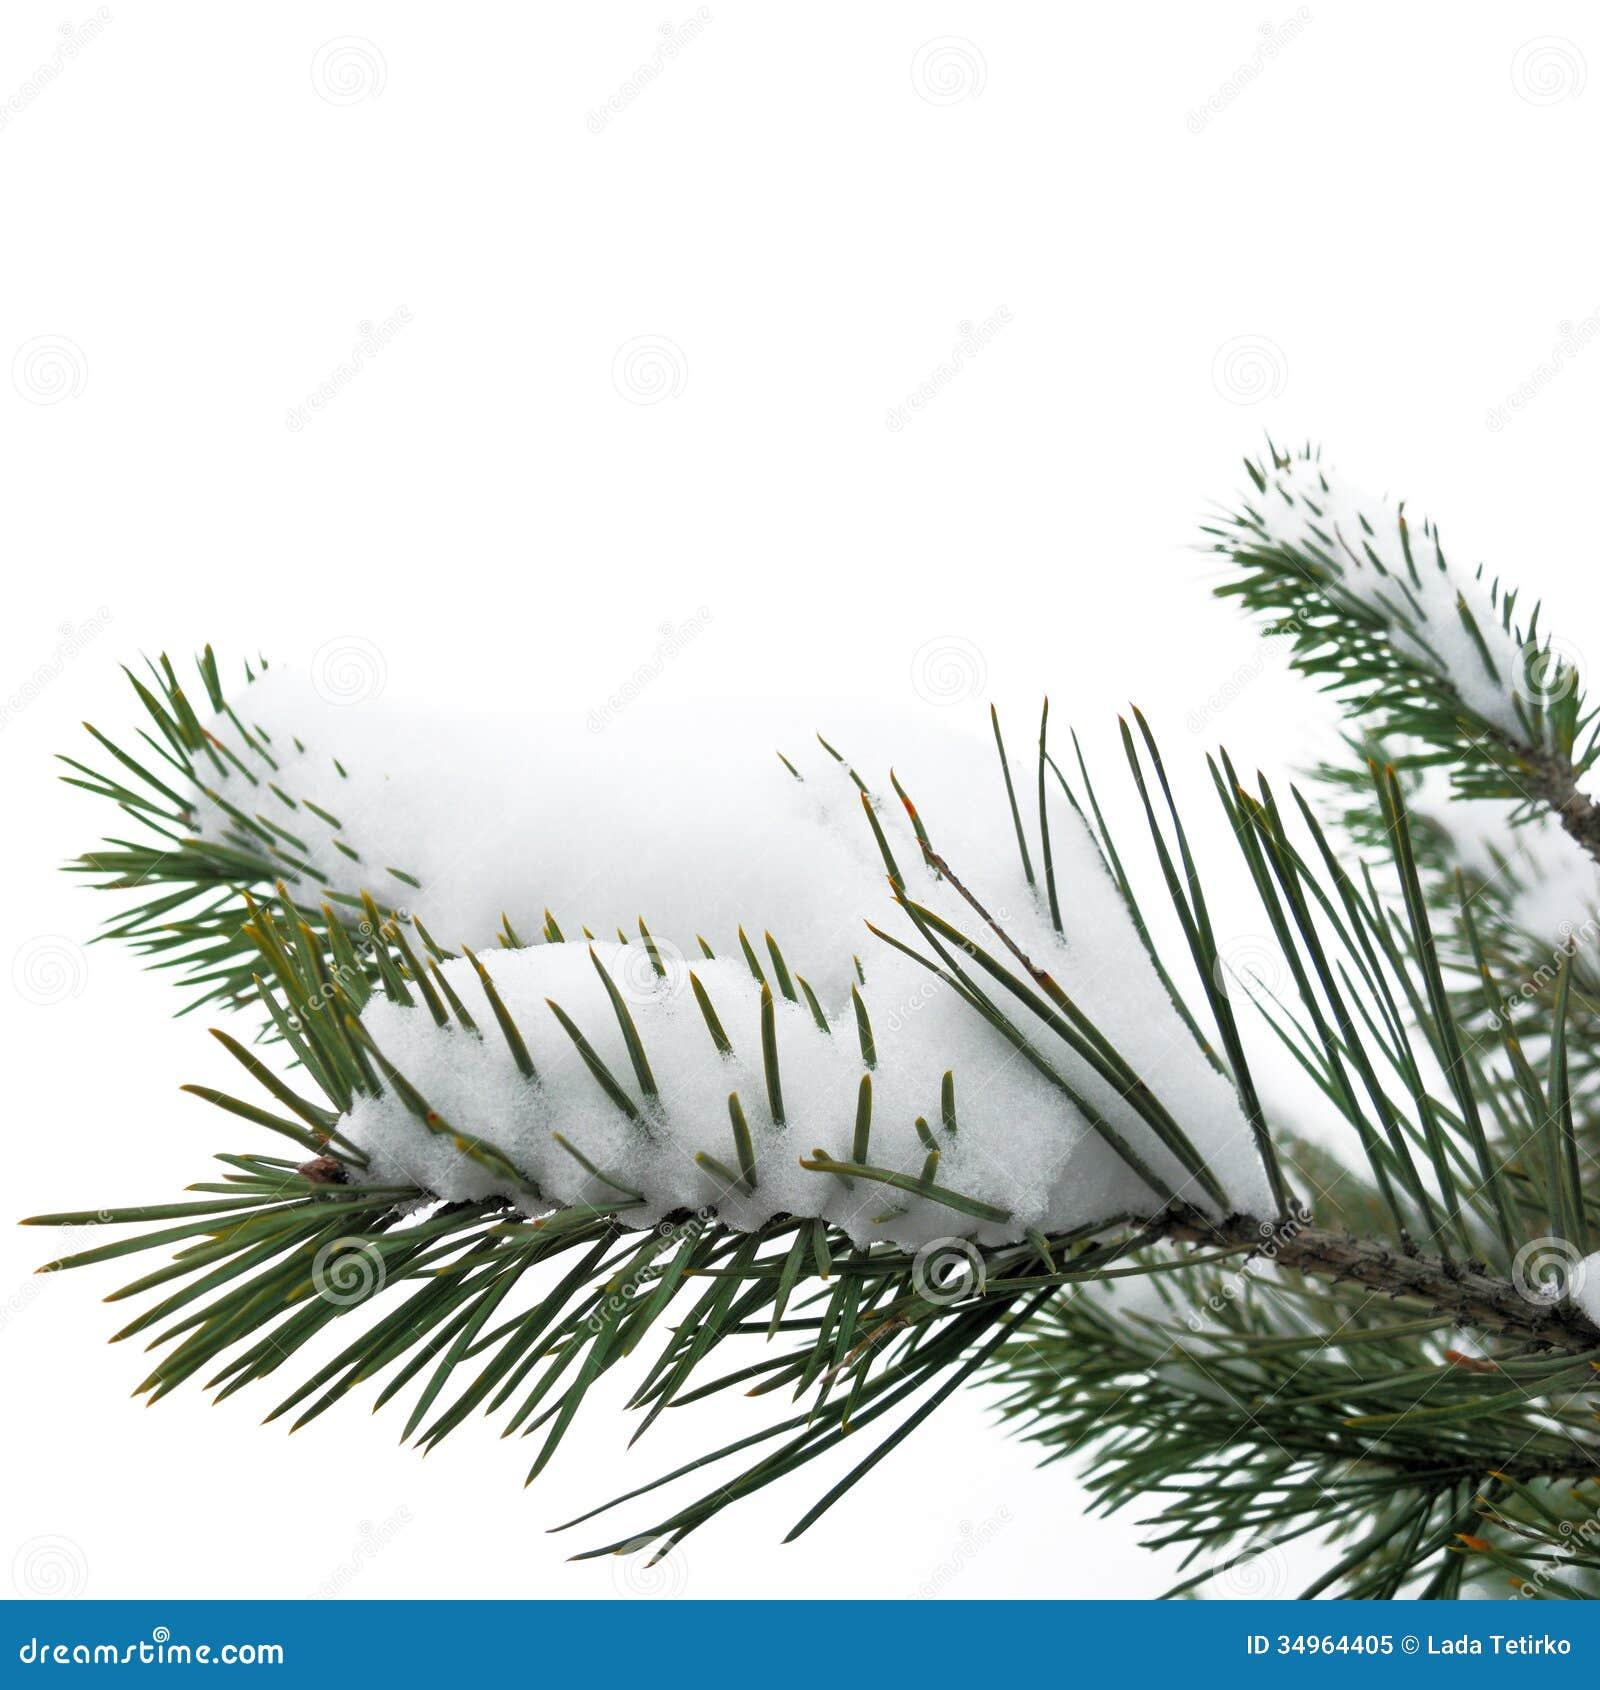 Snowy Christmas Tree Branch